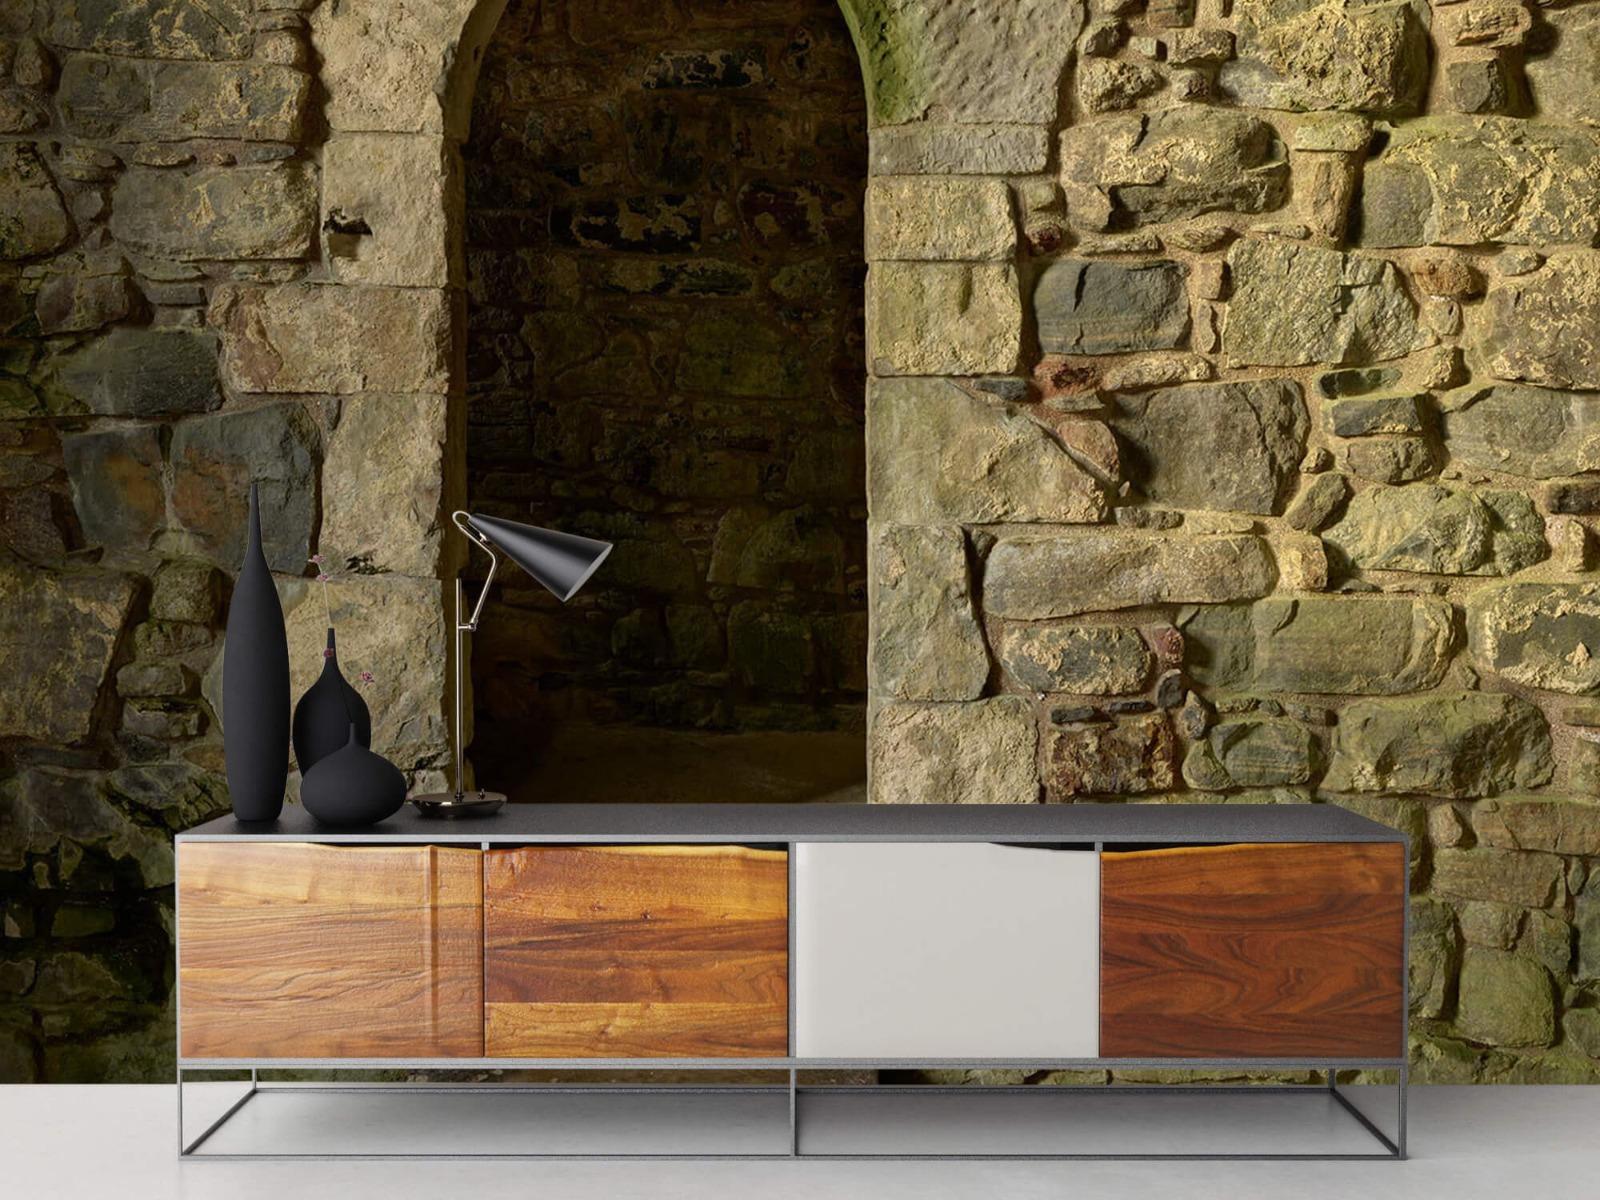 Steen behang - Oude muur met doorgang - Slaapkamer 16